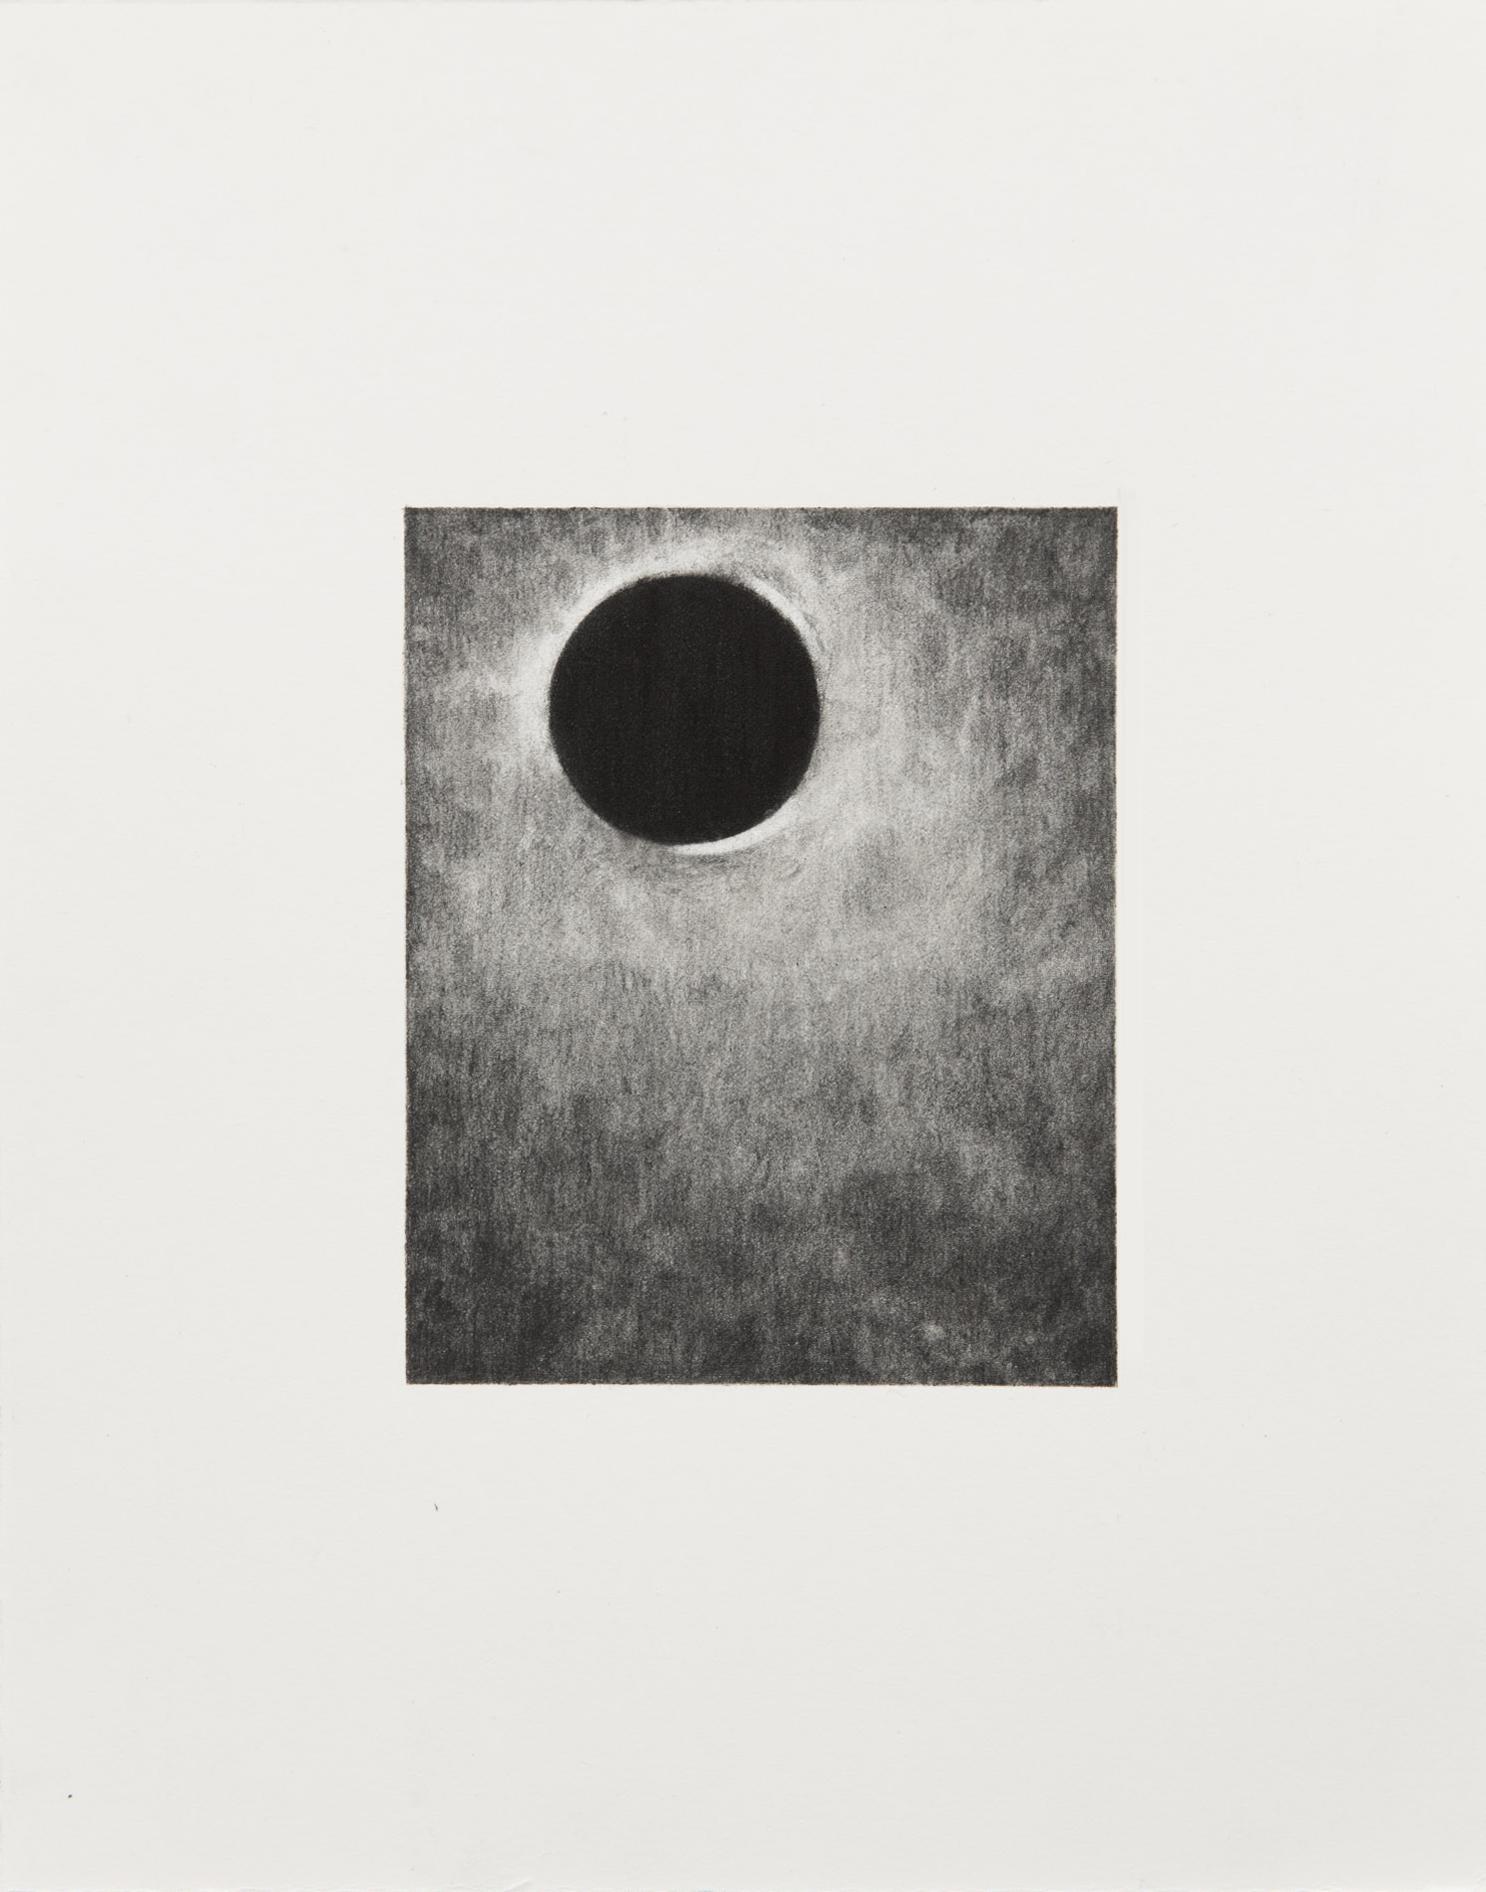 "Carl Trahan,  O   2,  2018, graphite sur papier, 12 x 10 cm (5"" x 4"")"